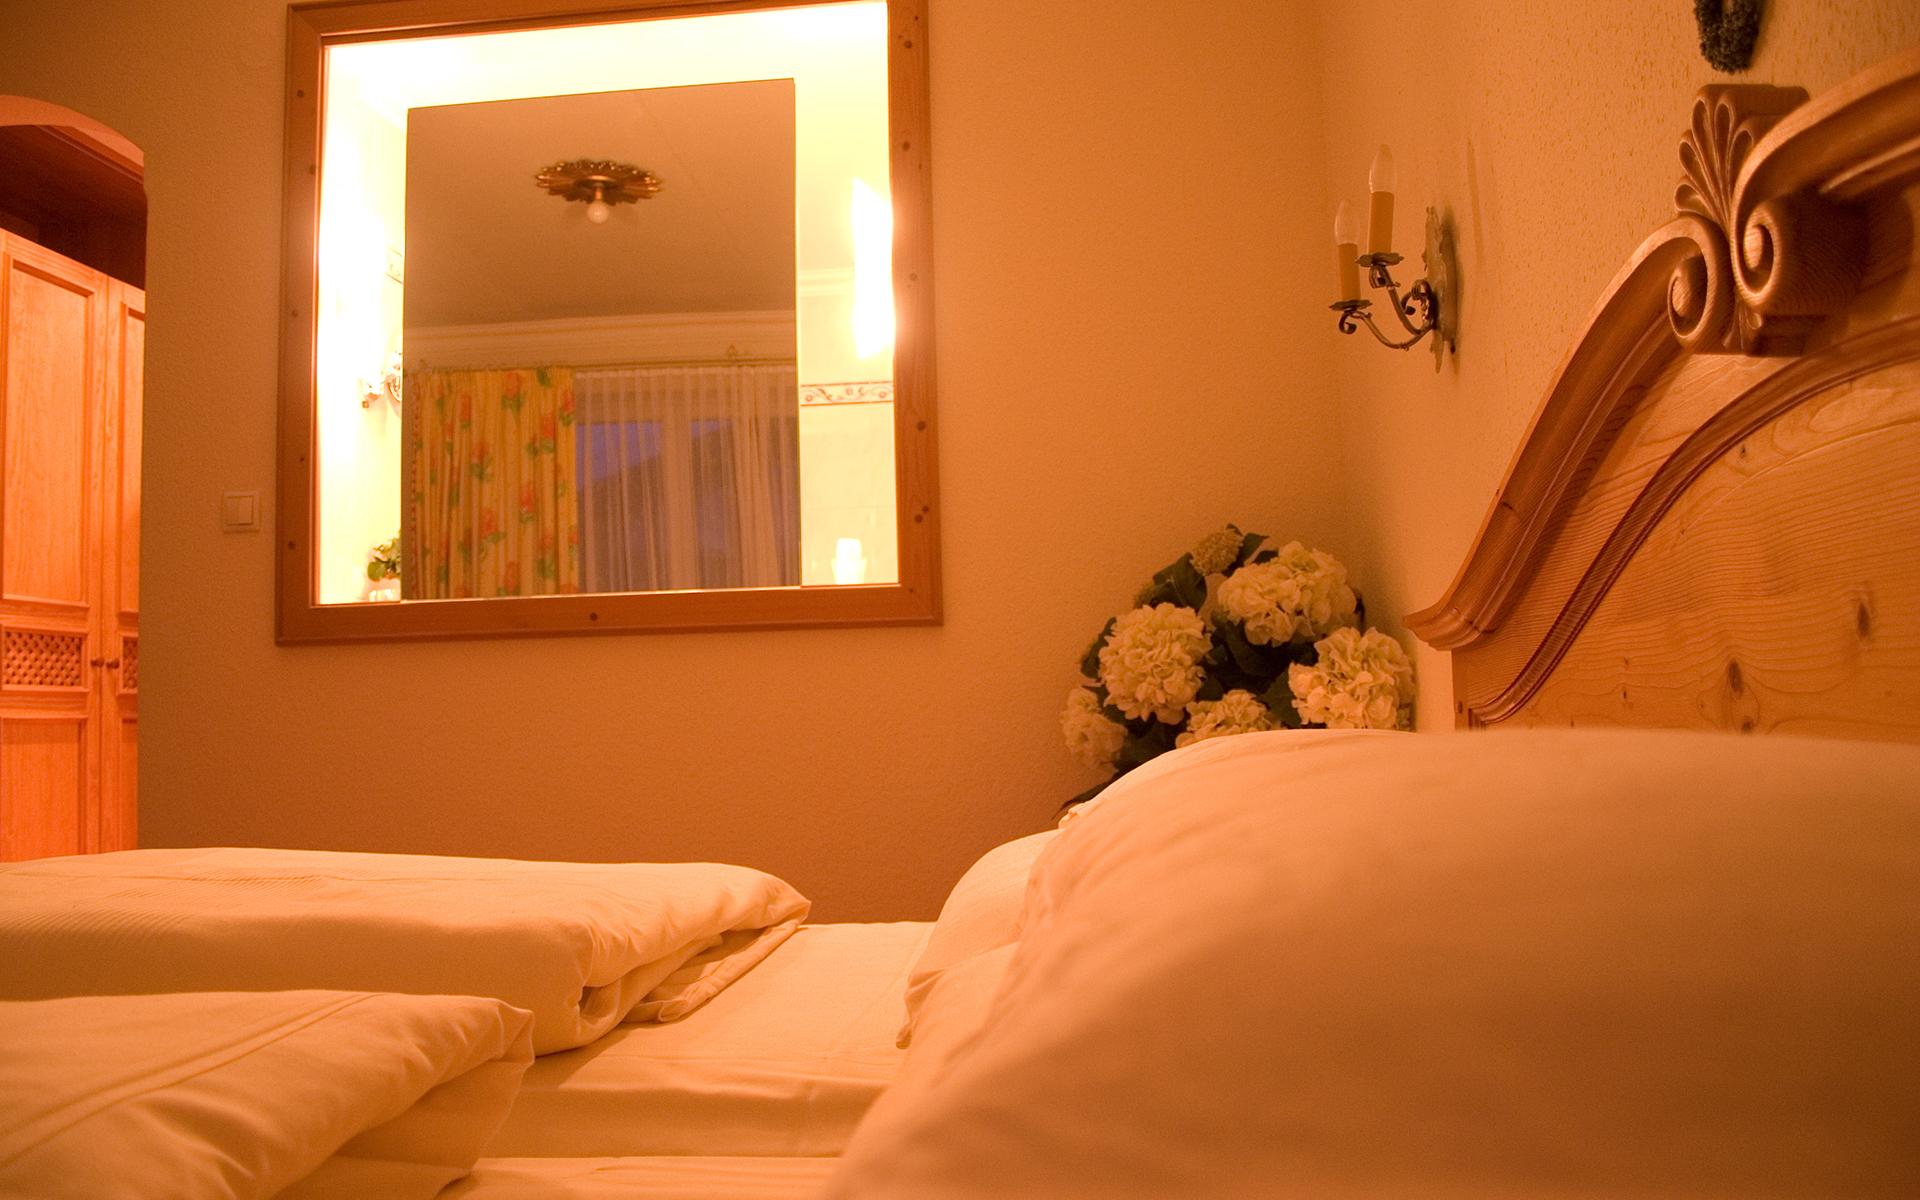 Hotel Erzberg Doppelzimmer